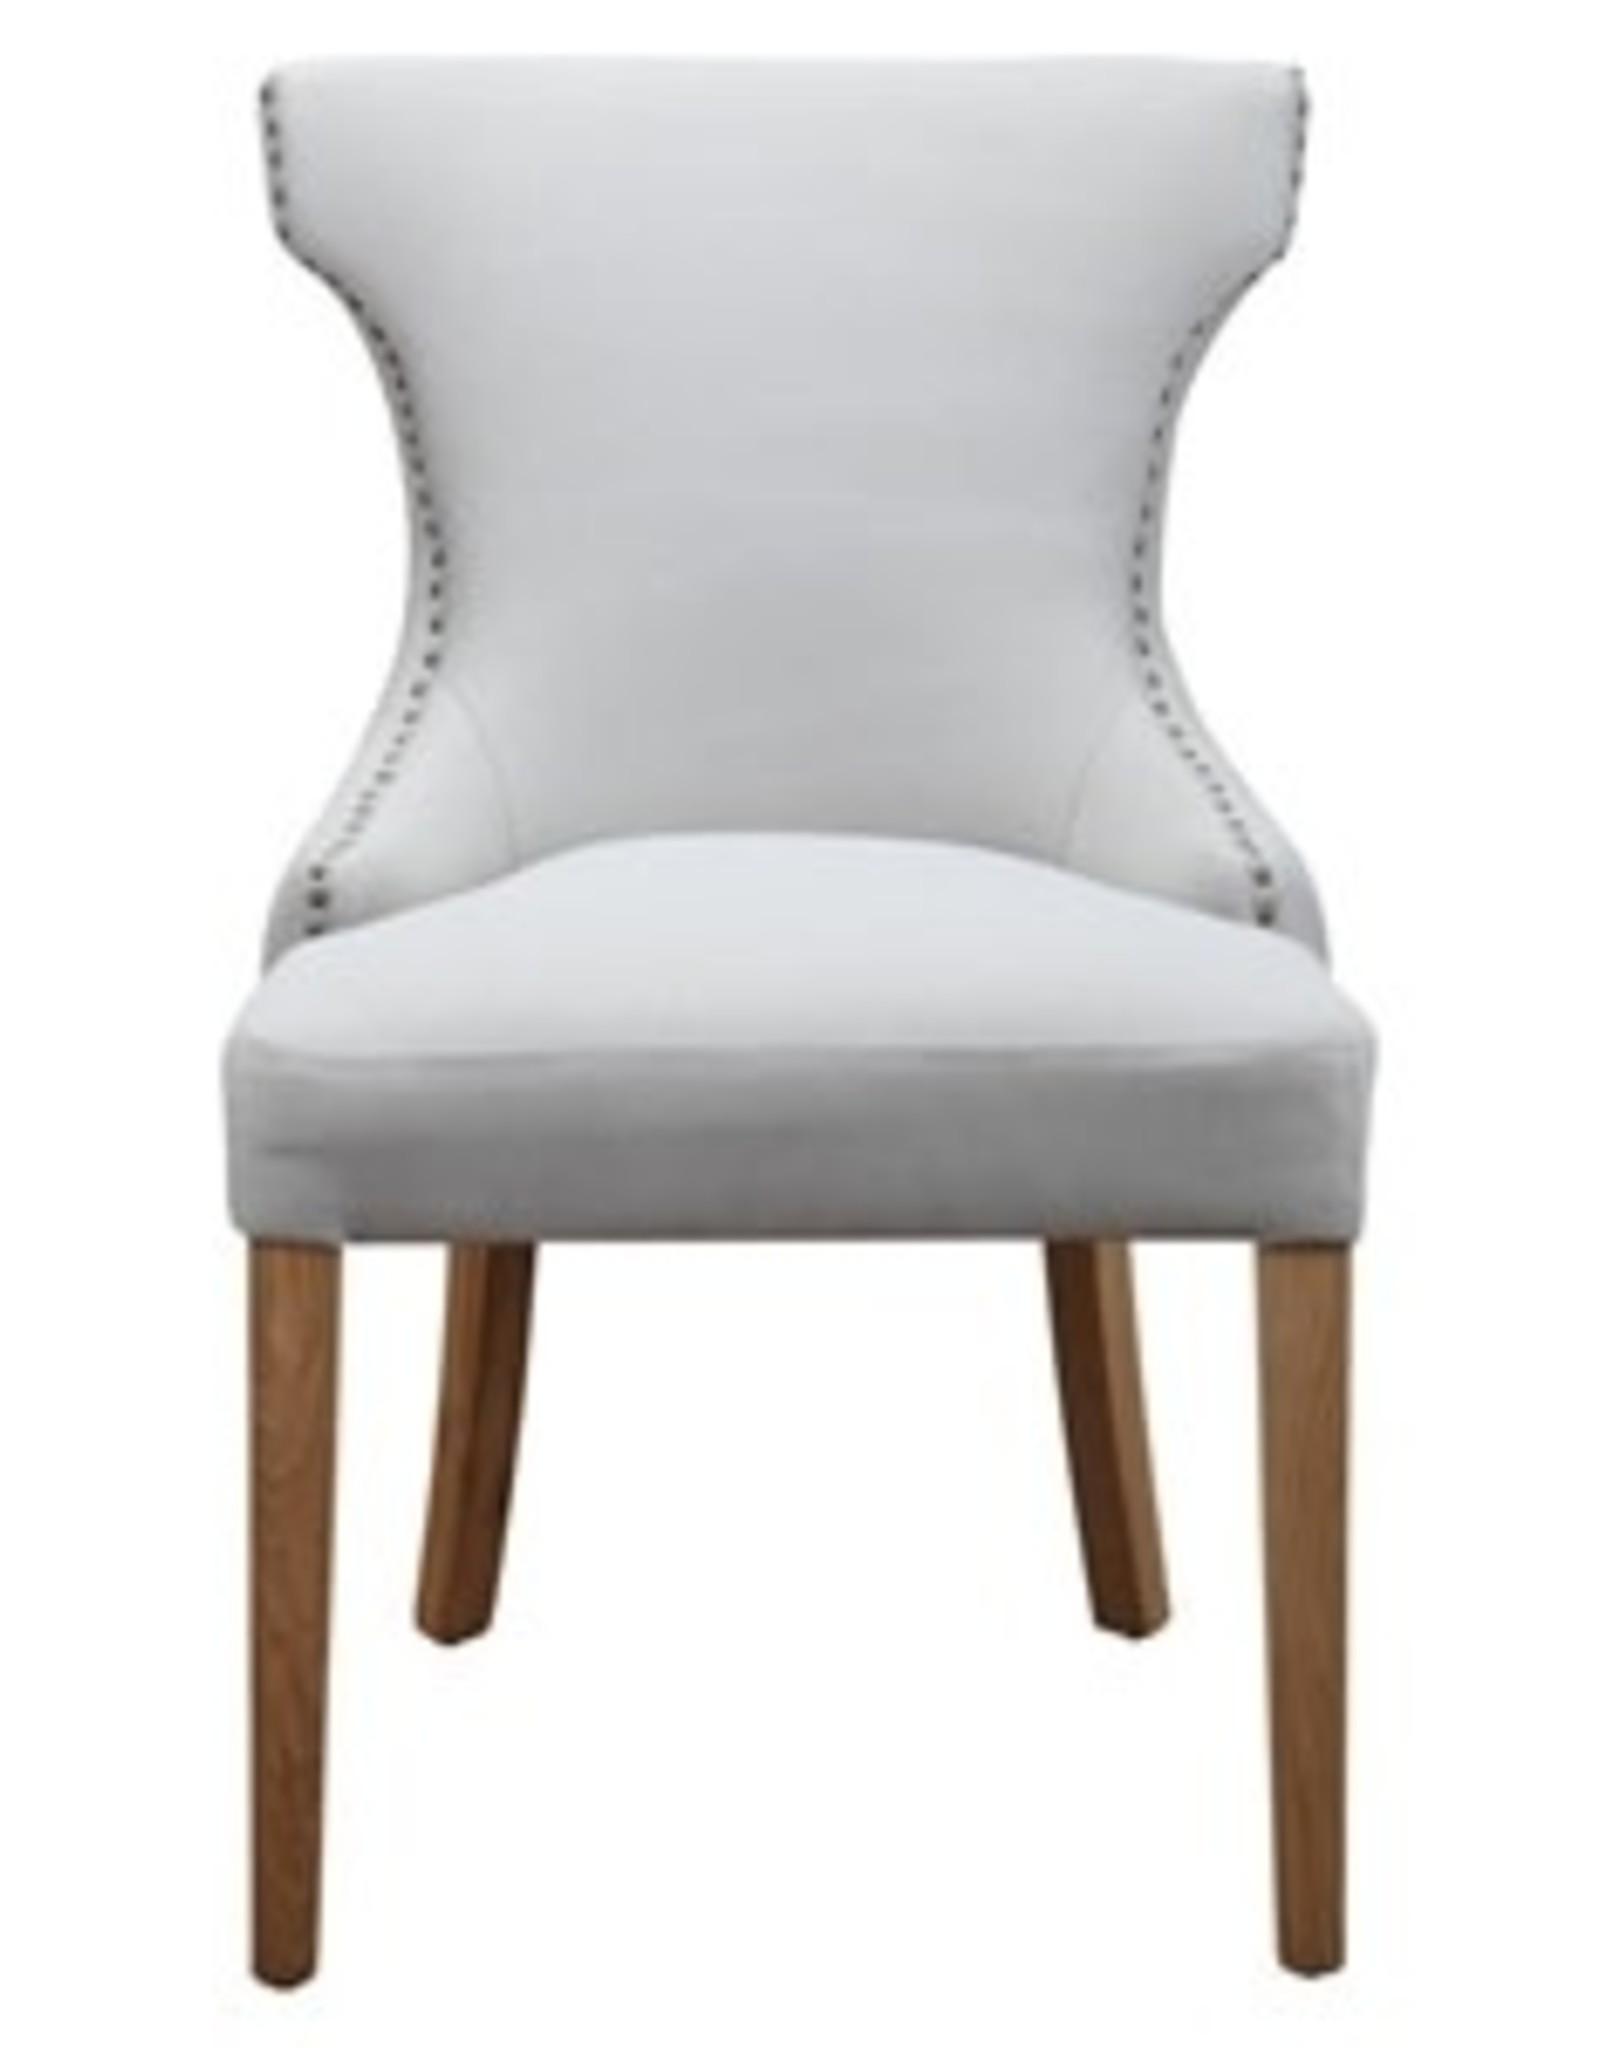 Bruna Side Chair